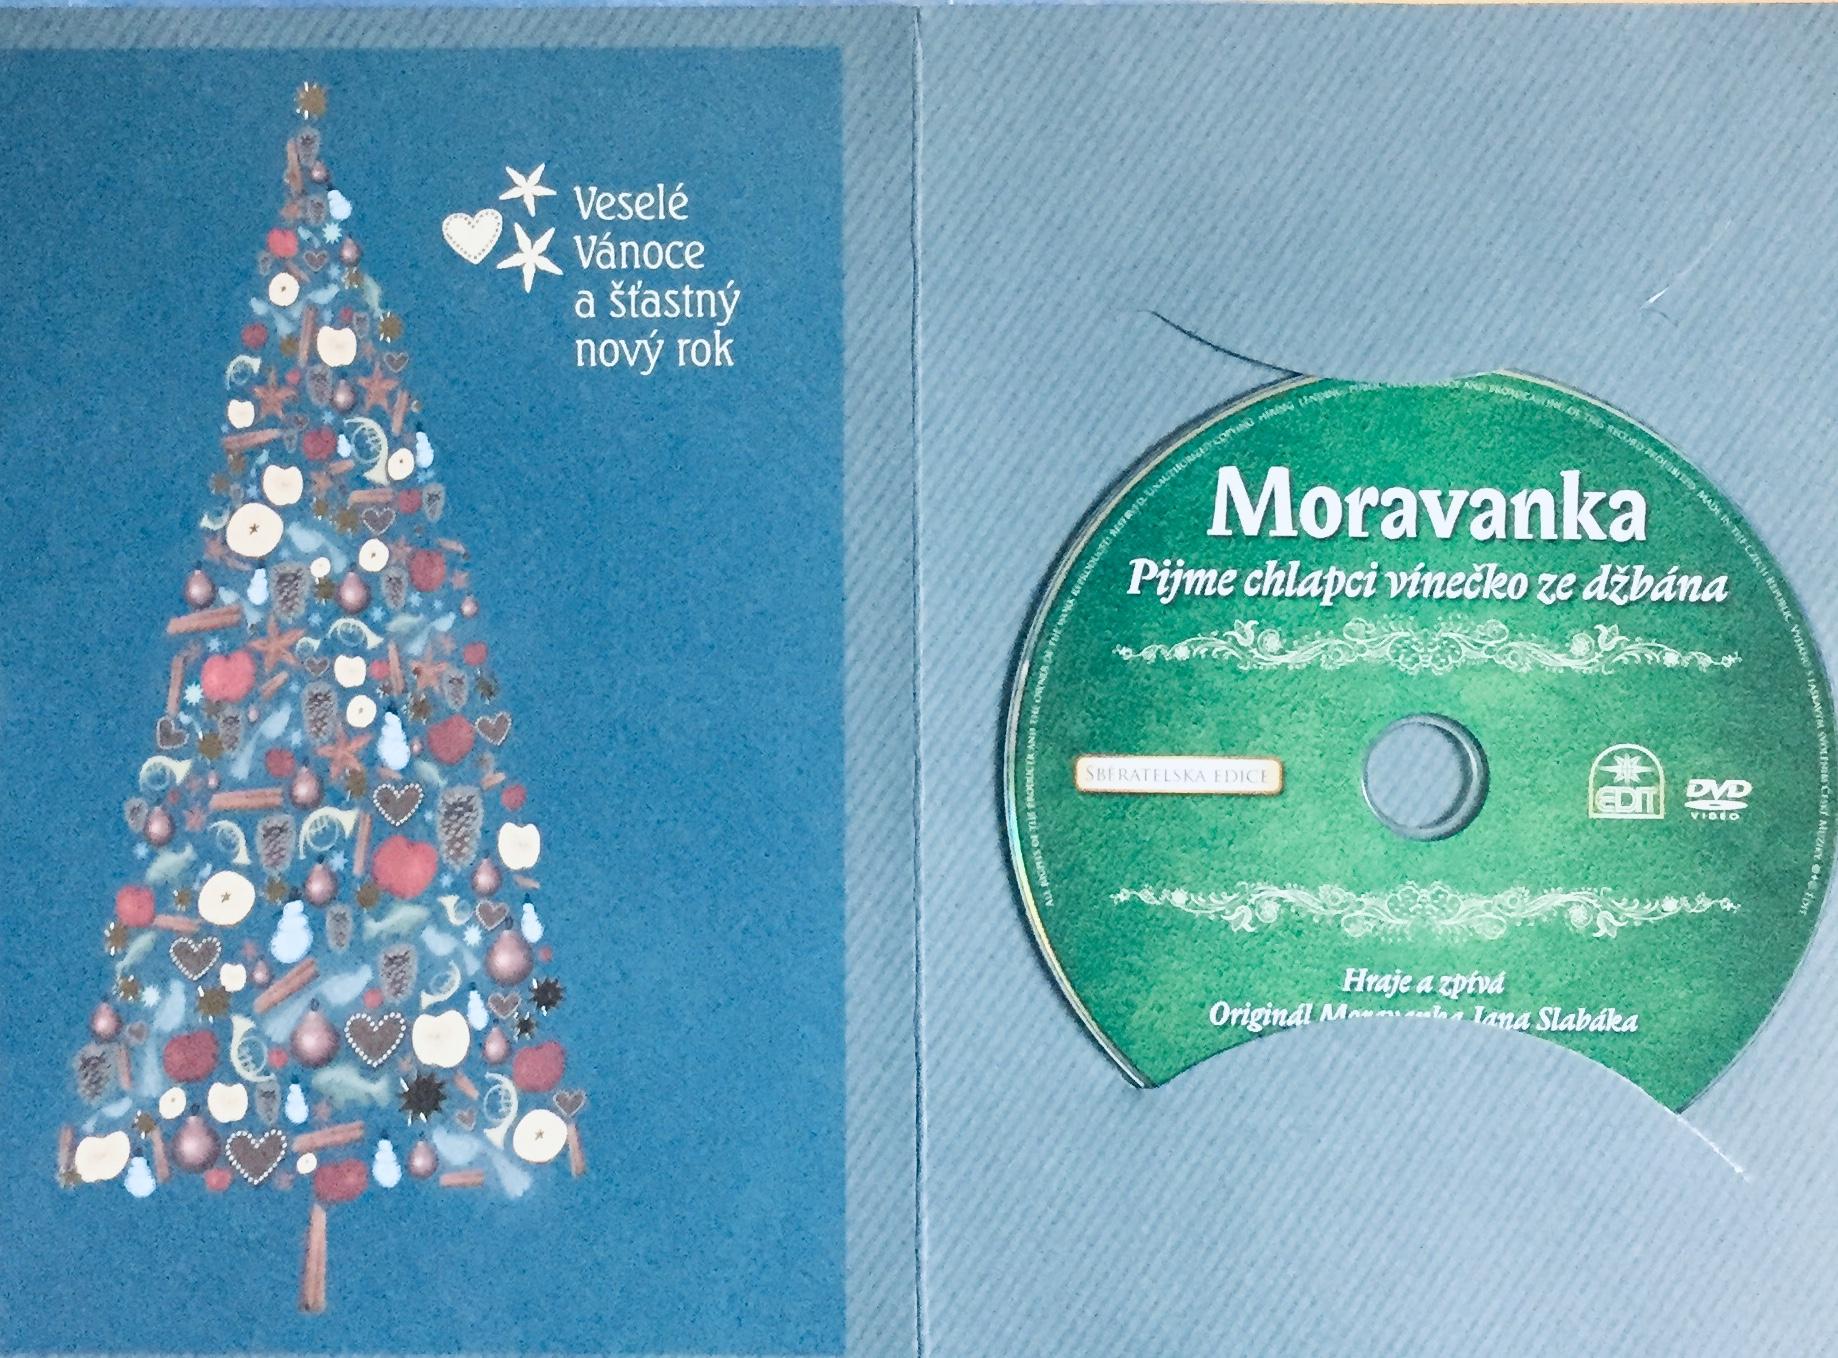 Moravanka - Pijme chlapci vínečko ze džbána - DVD /dárkový obal/